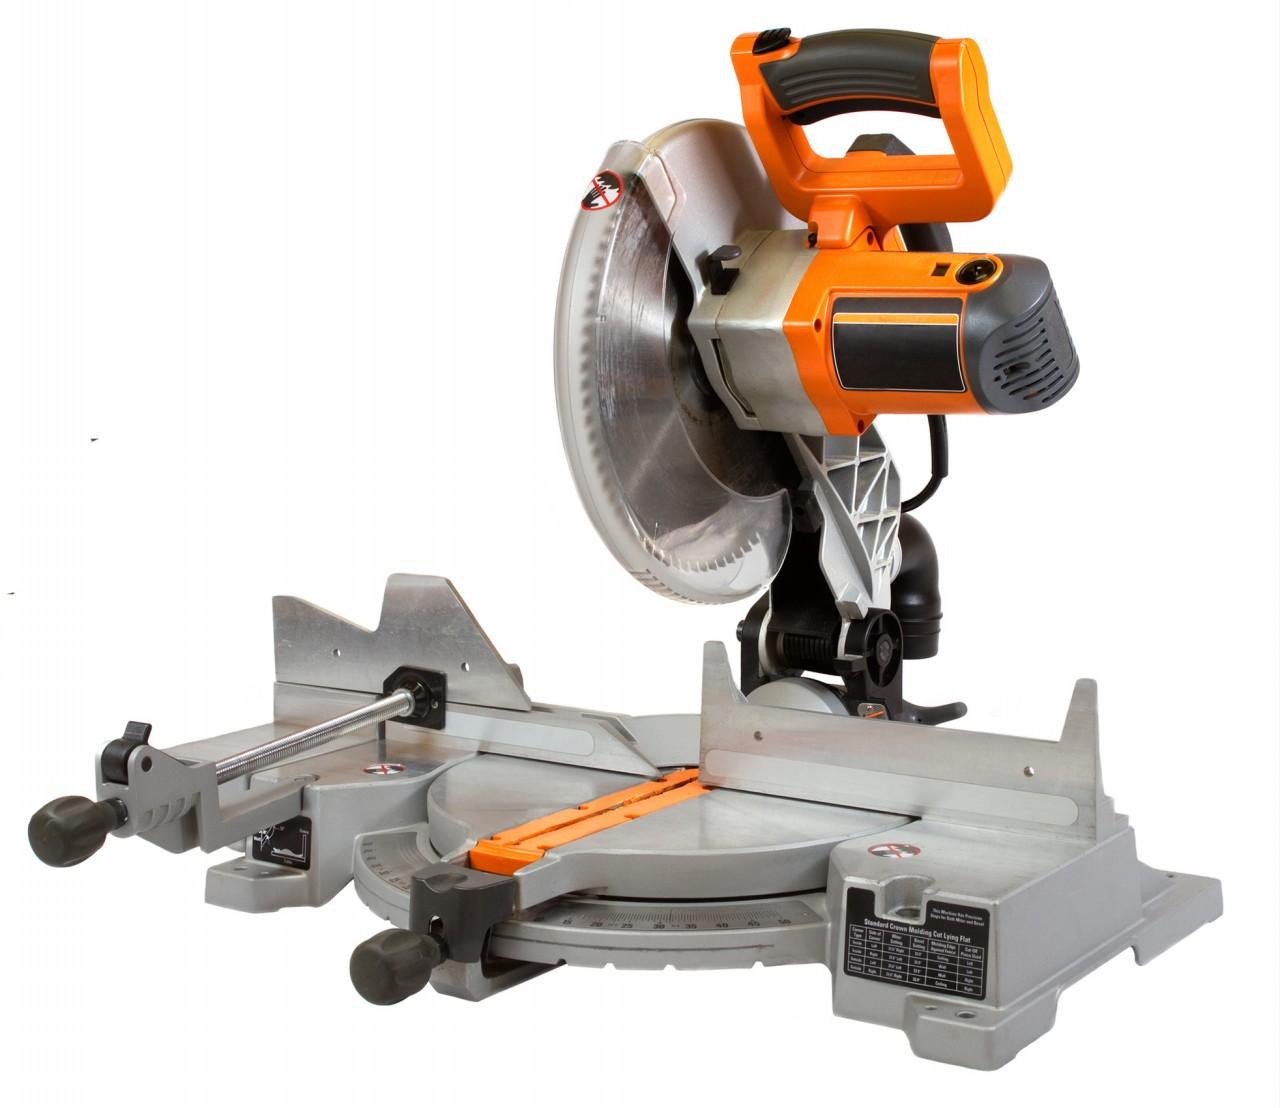 ... screw gun nail gun construction tools woodwork tools reciprocating saw